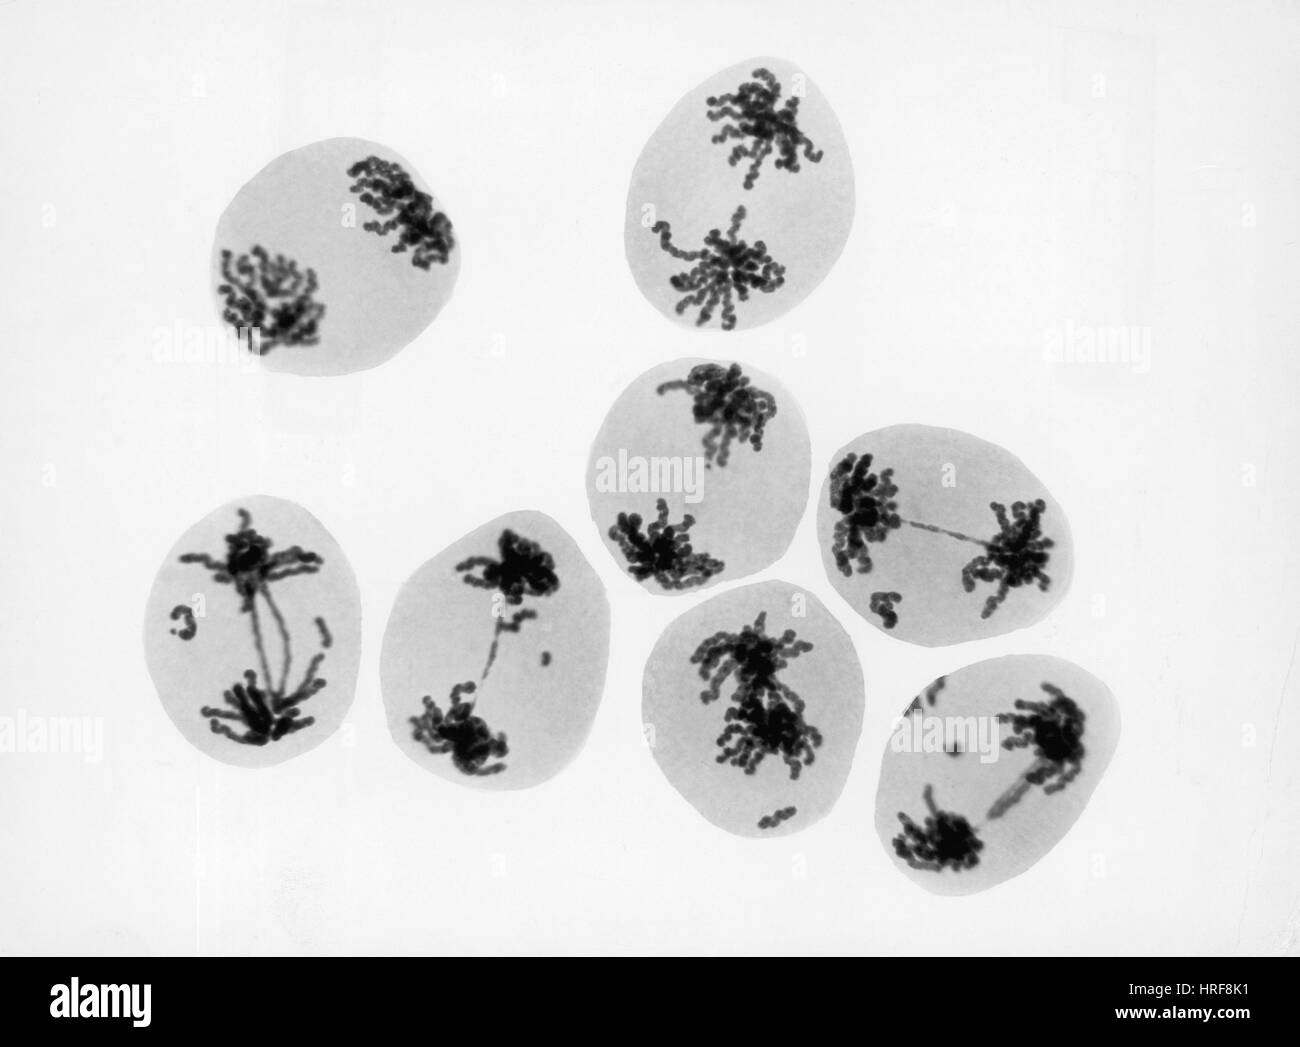 Meiosis in T. erectum after Radiation Exposure - Stock Image